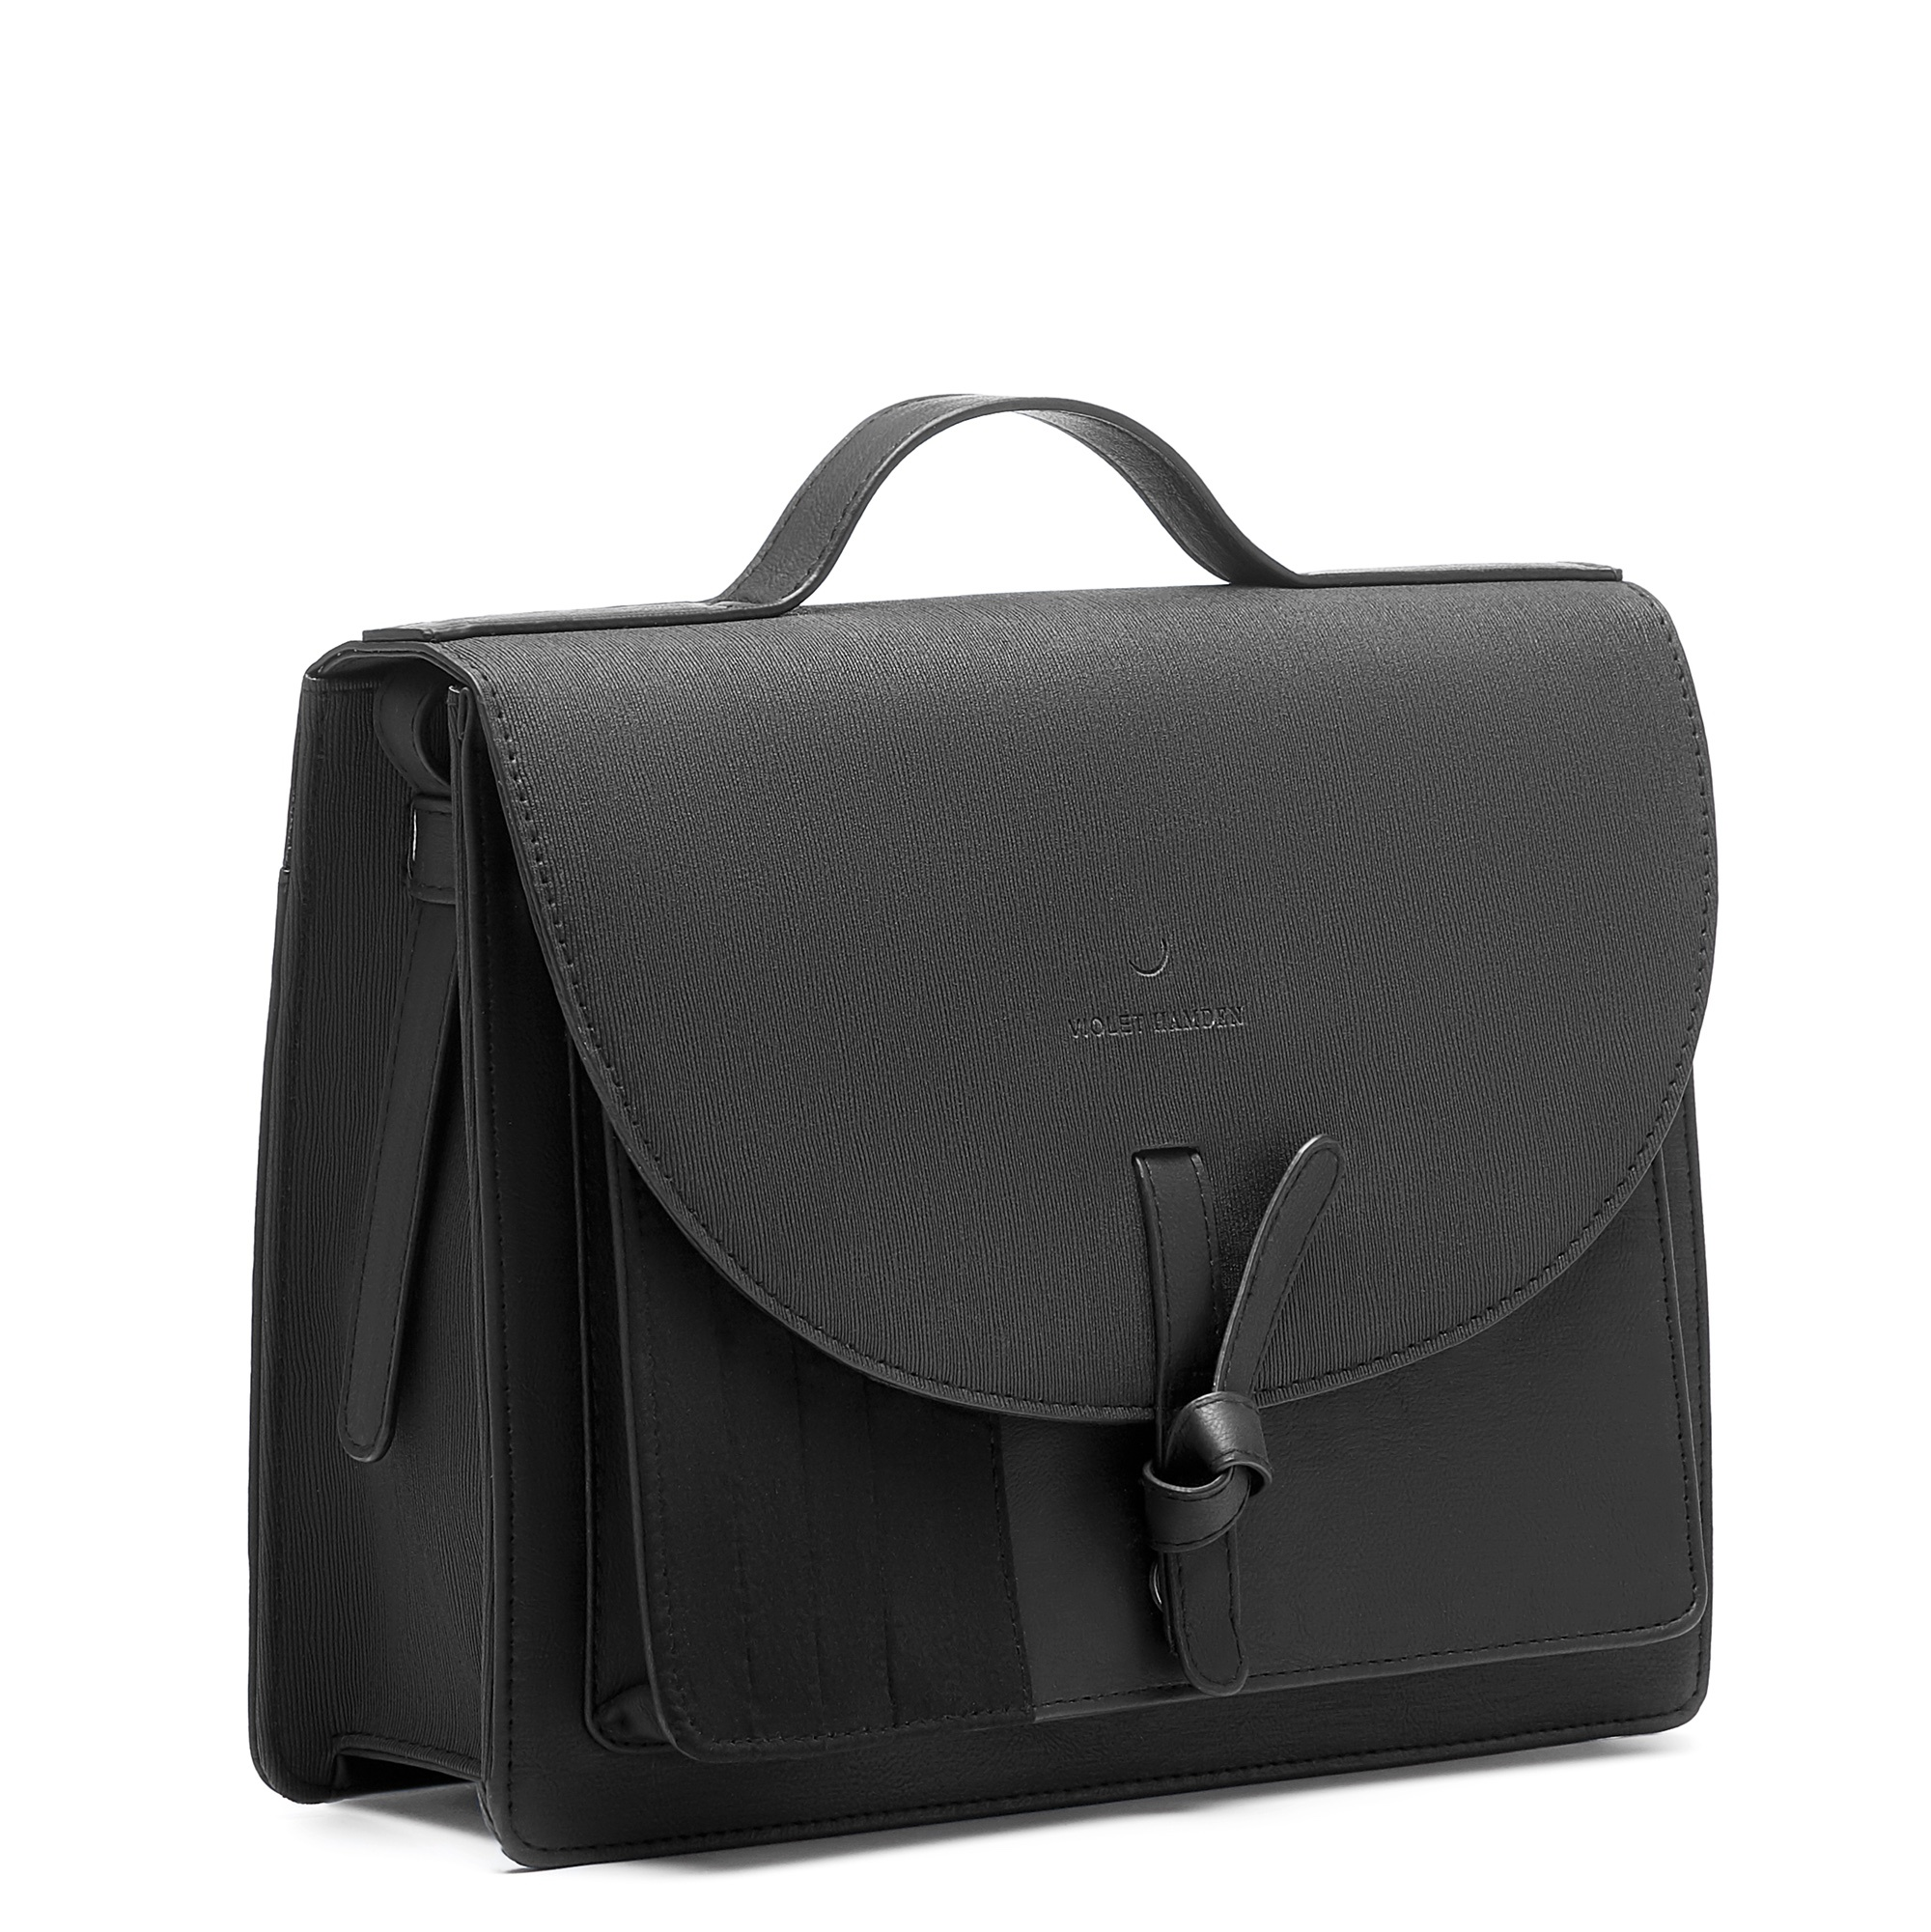 Violet Hamden Essential Bag zwarte crossbody